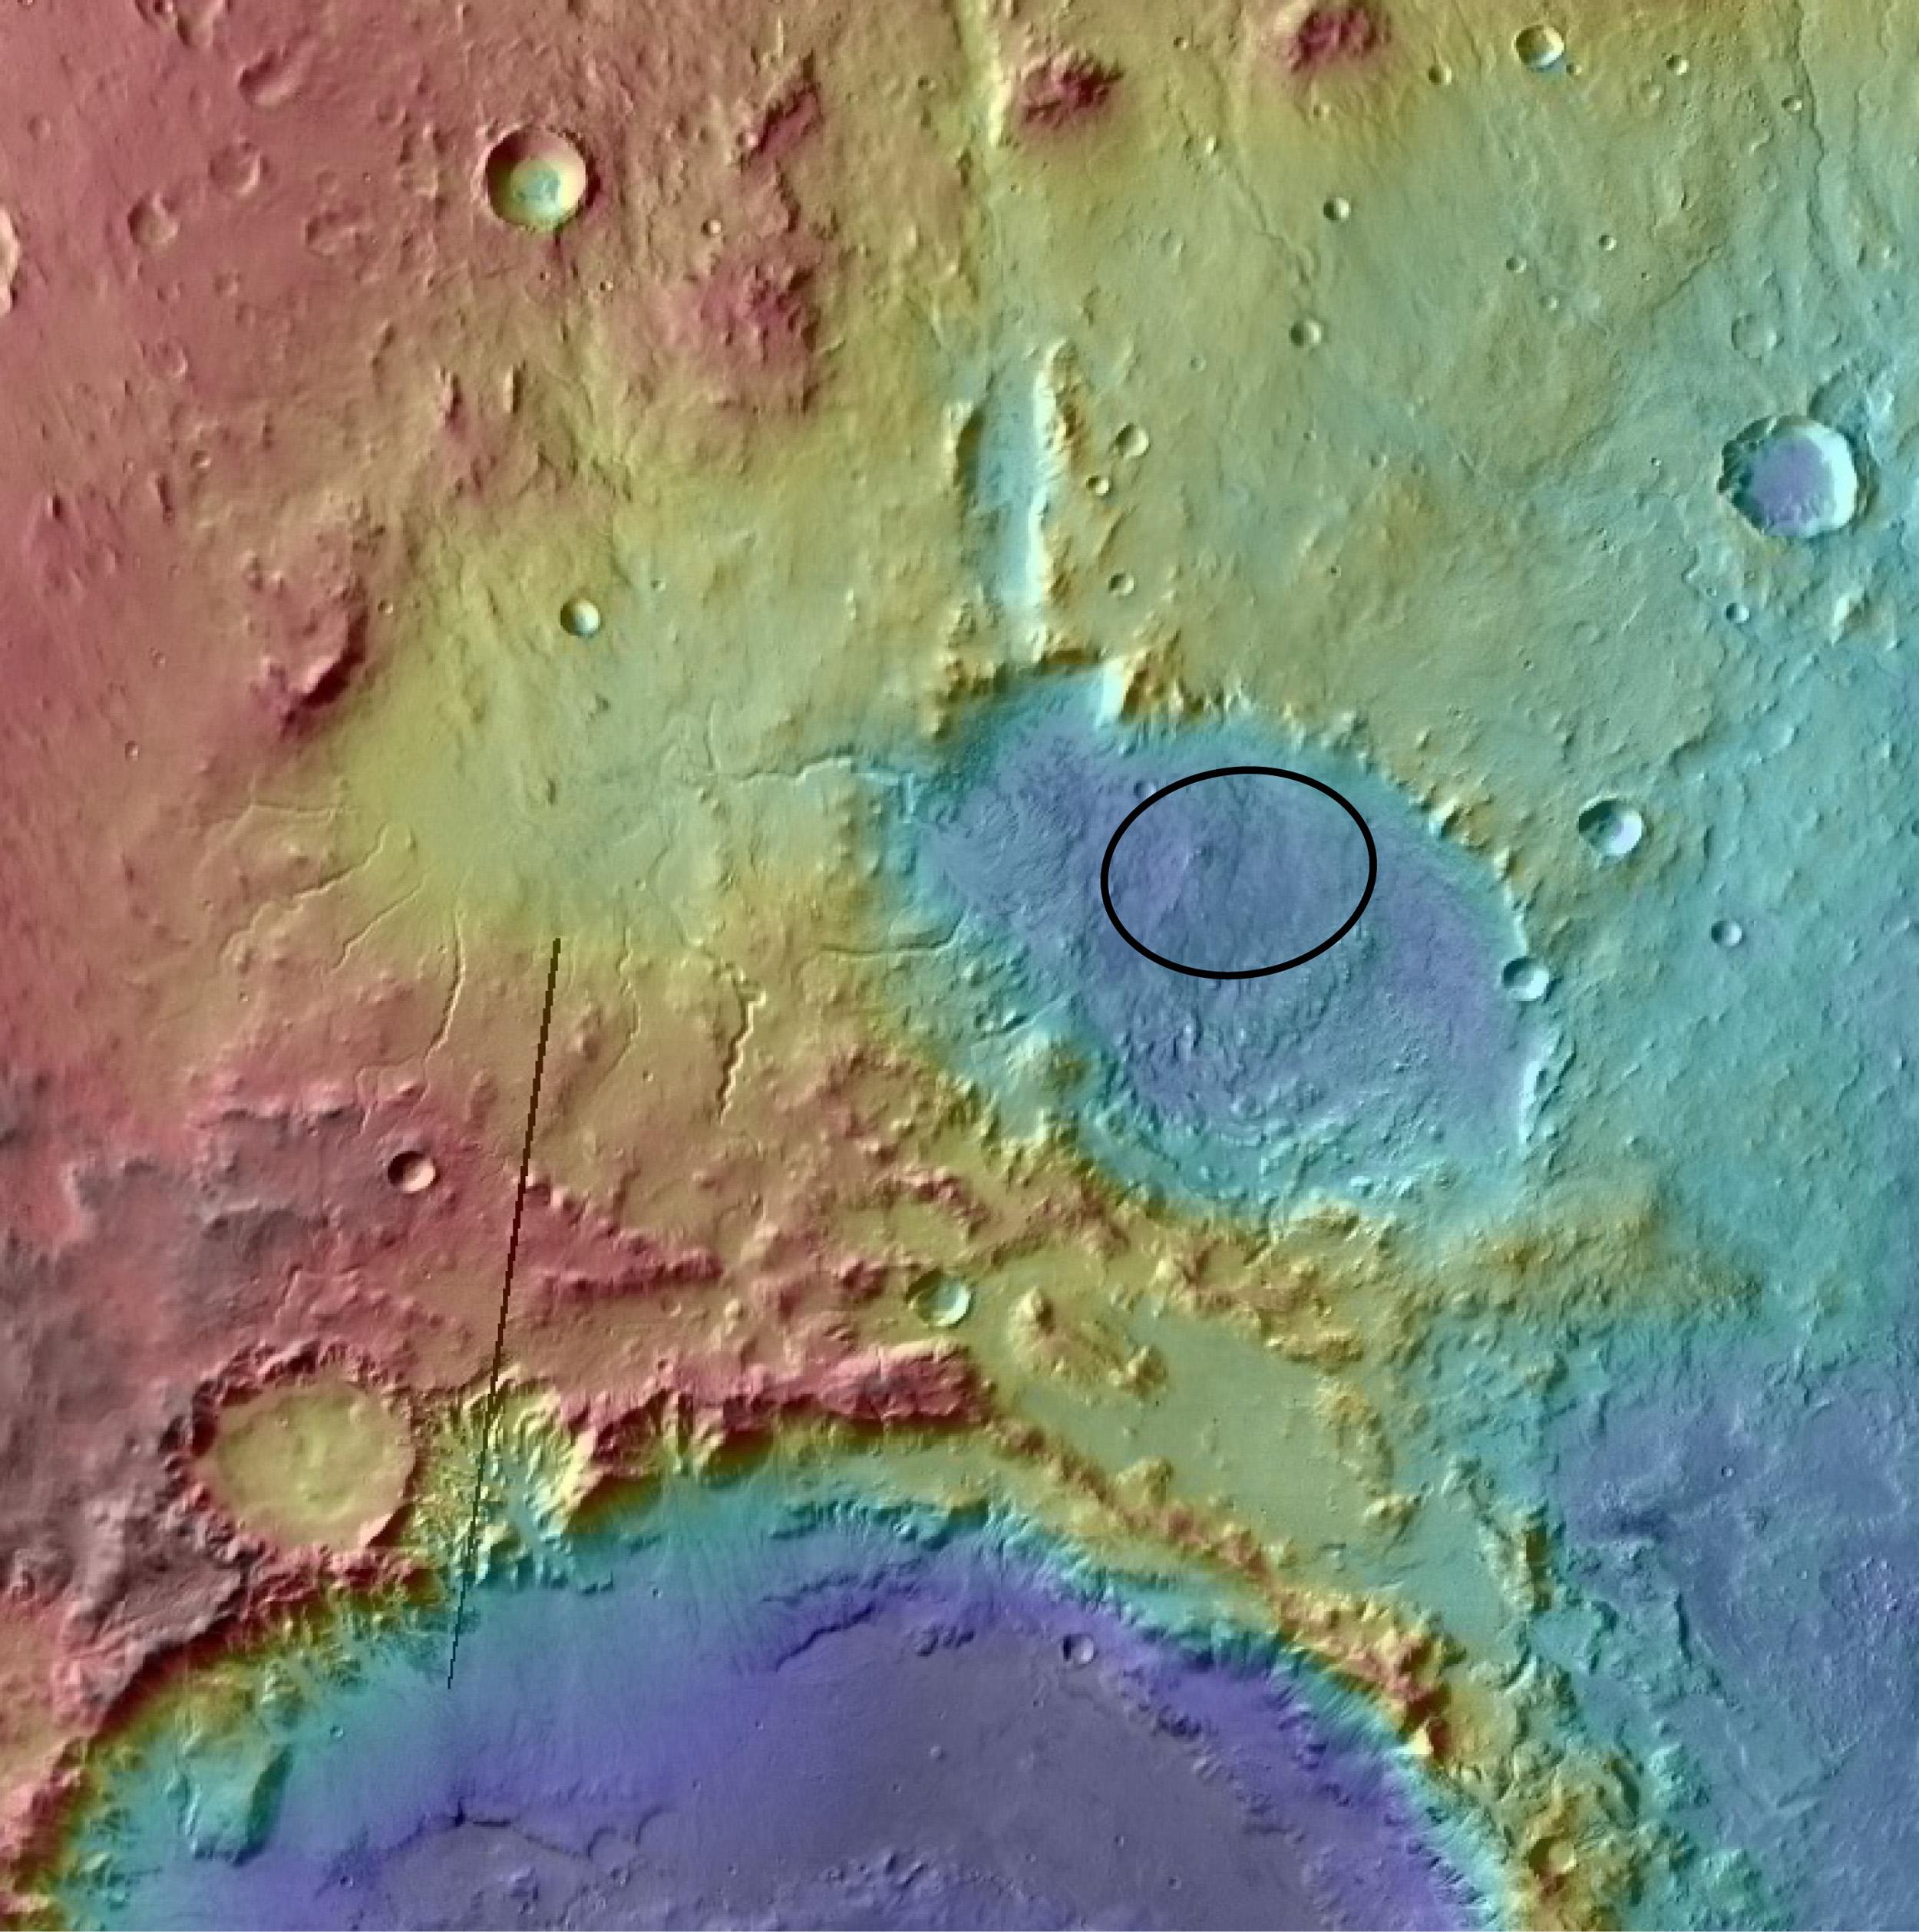 Re: Curiosity: Mars Science Laboratory